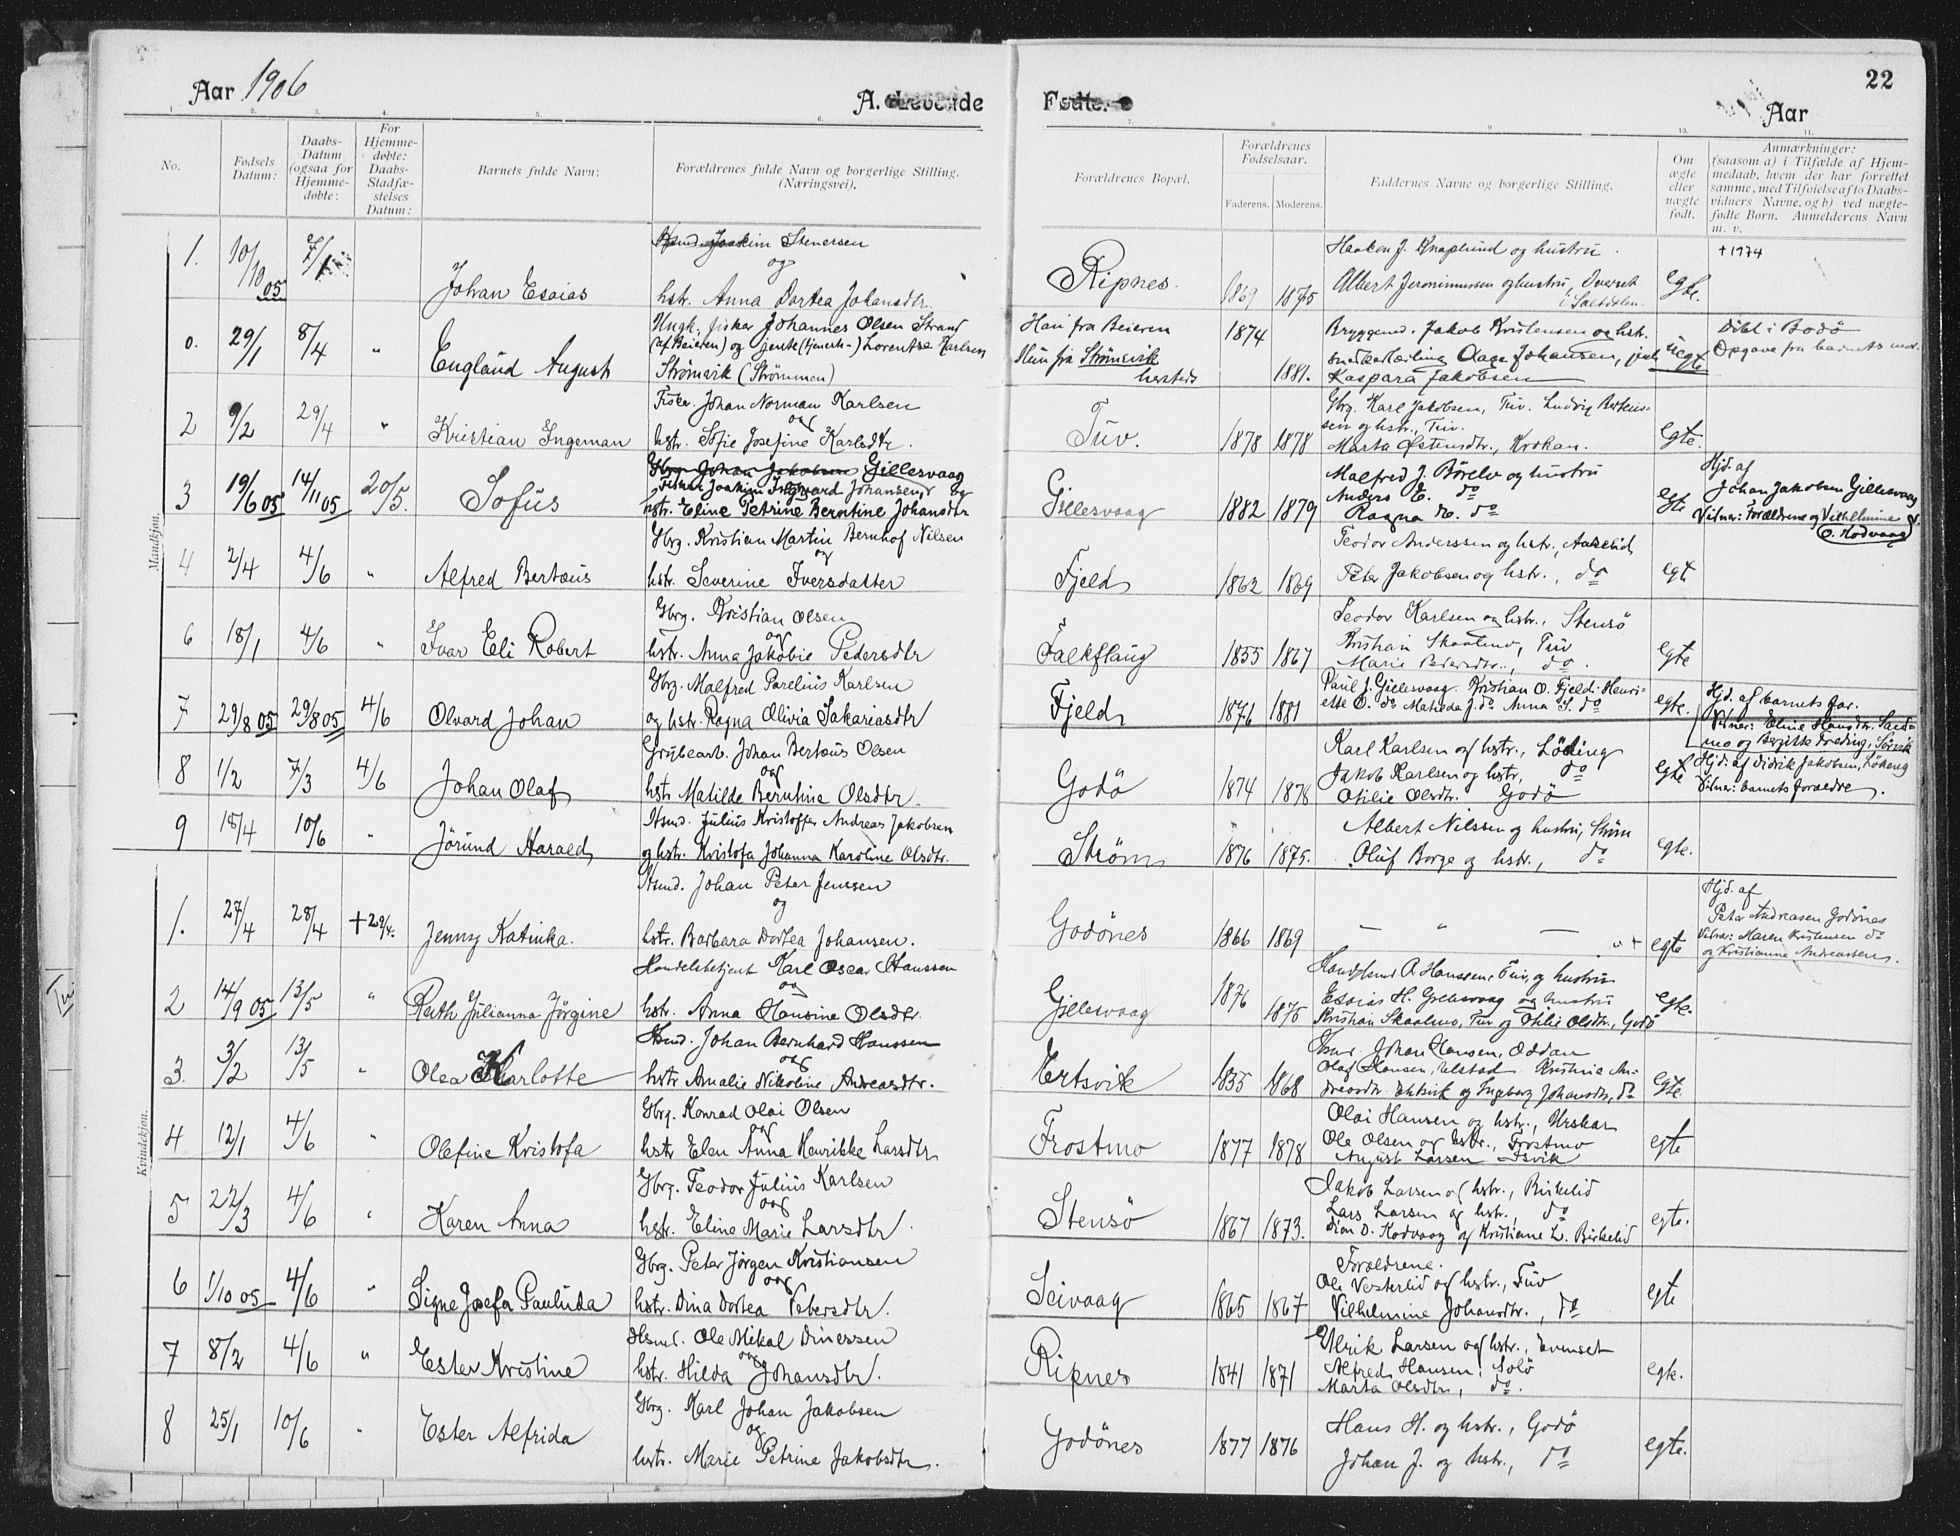 SAT, Ministerialprotokoller, klokkerbøker og fødselsregistre - Nordland, 804/L0081: Ministerialbok nr. 804A02, 1901-1915, s. 22